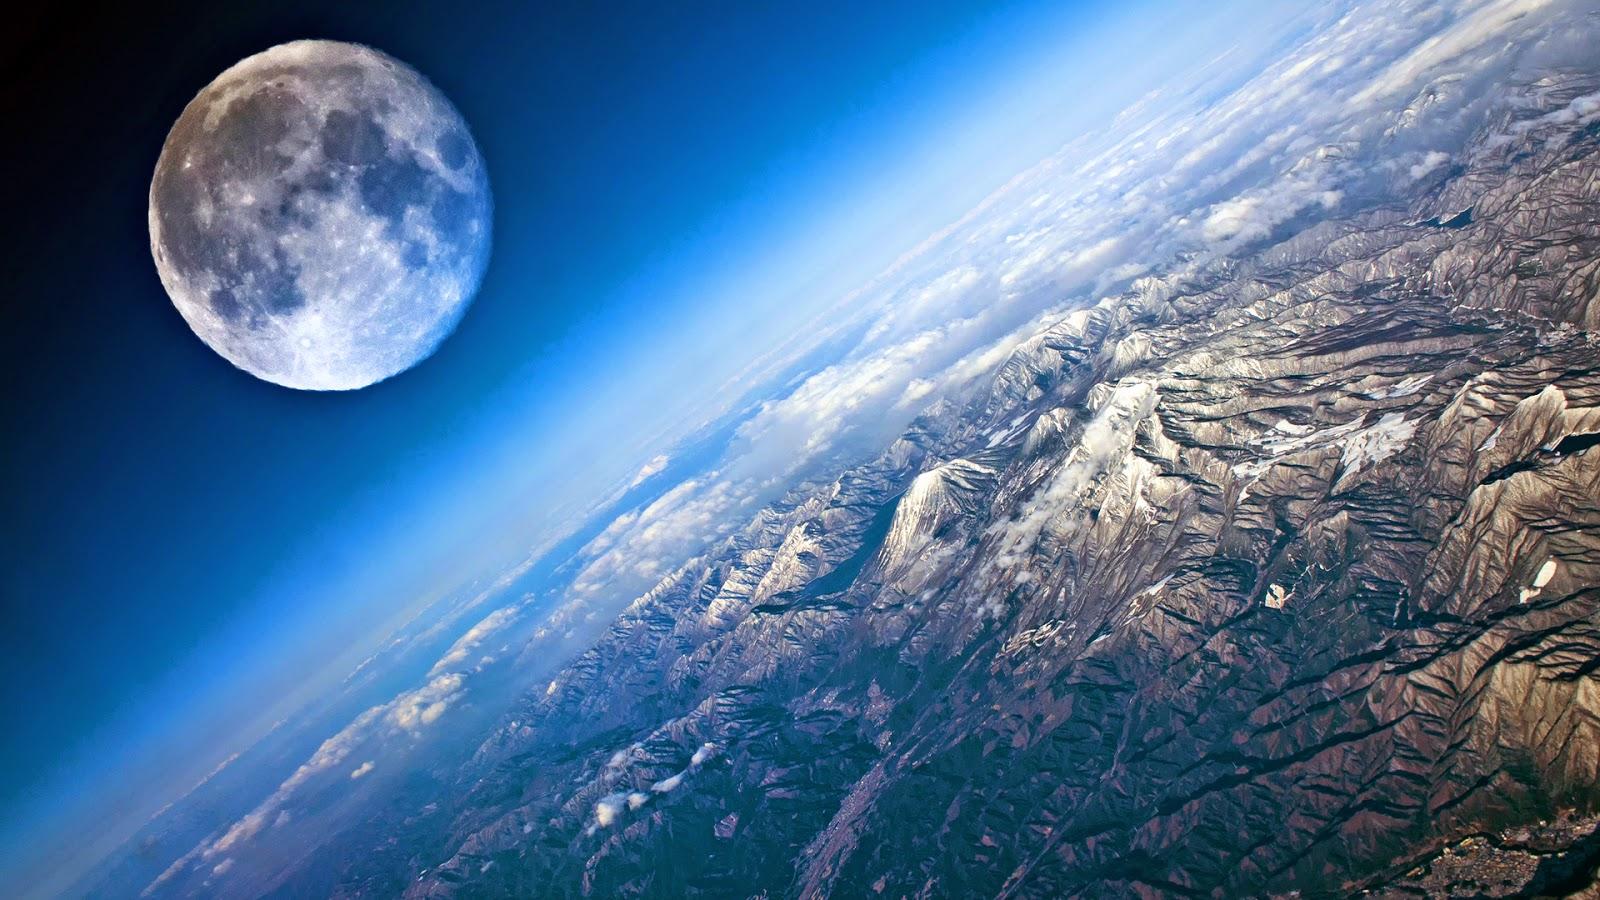 Moon High Resolution Wallpaper